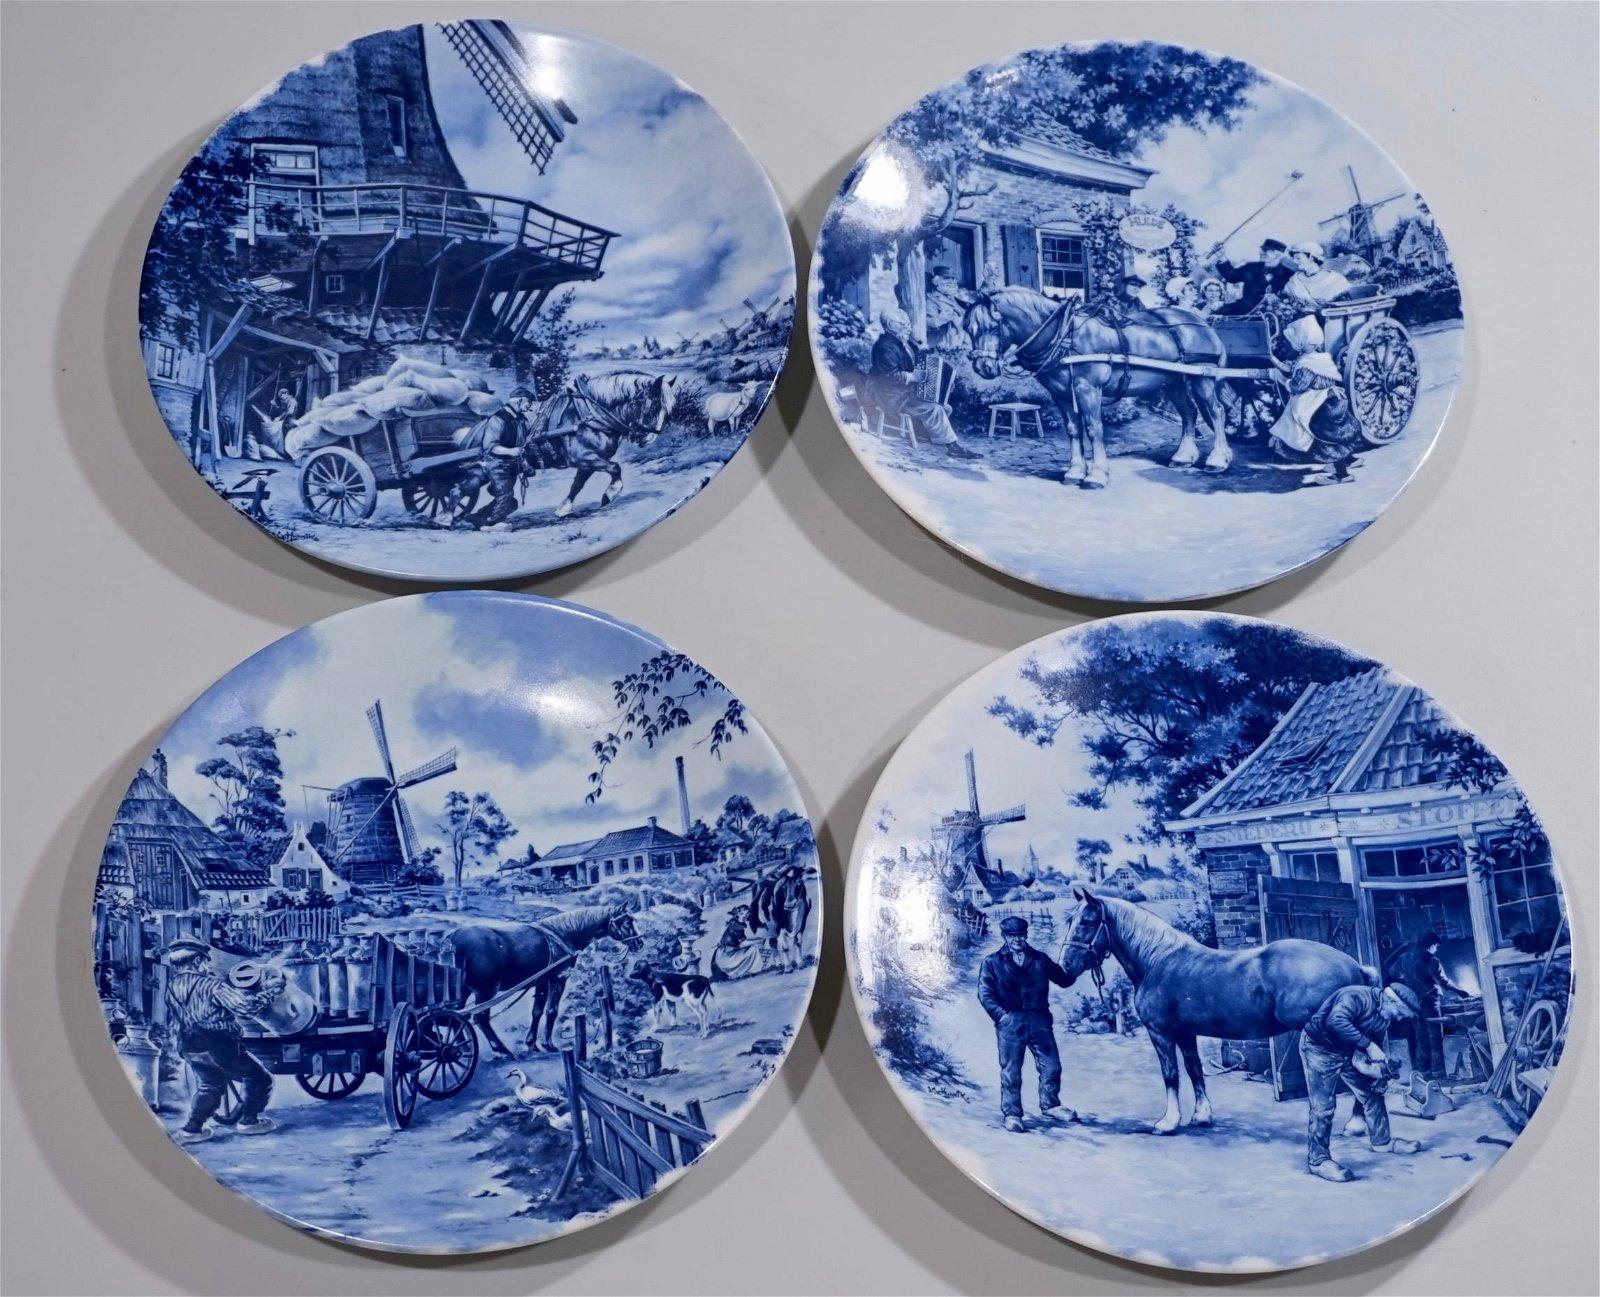 Hollands Delfts Blauw Tos Horse Theme Equestrian Plate